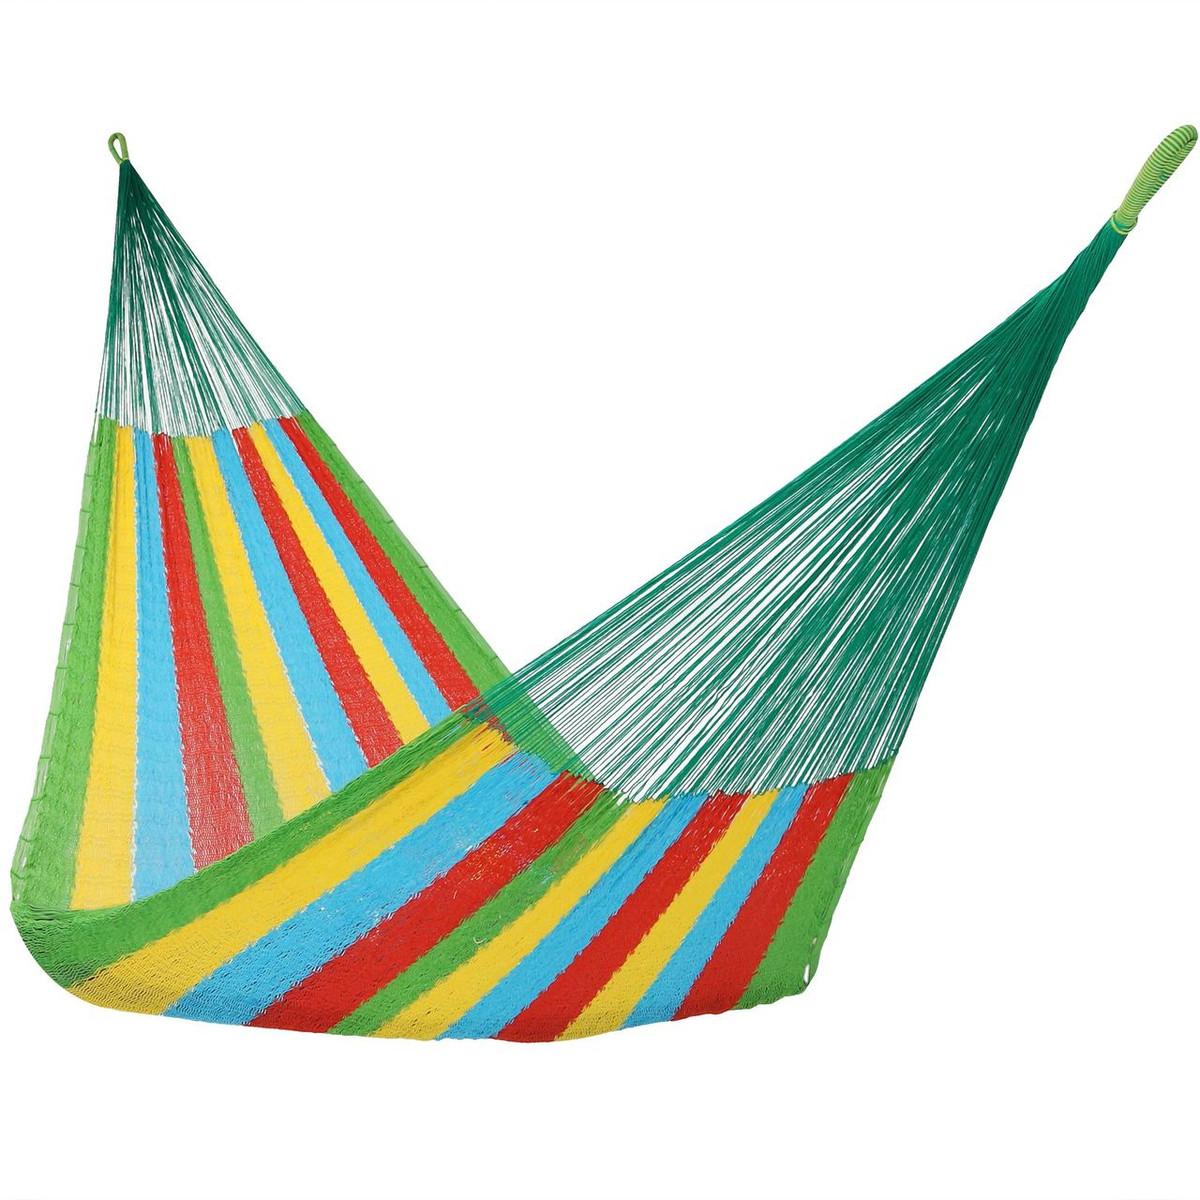 Sunnydaze Portable Hand Woven 1 Person Mayan Hammock, Single Size, 330  Pound Capacity | Outdoor Furniture